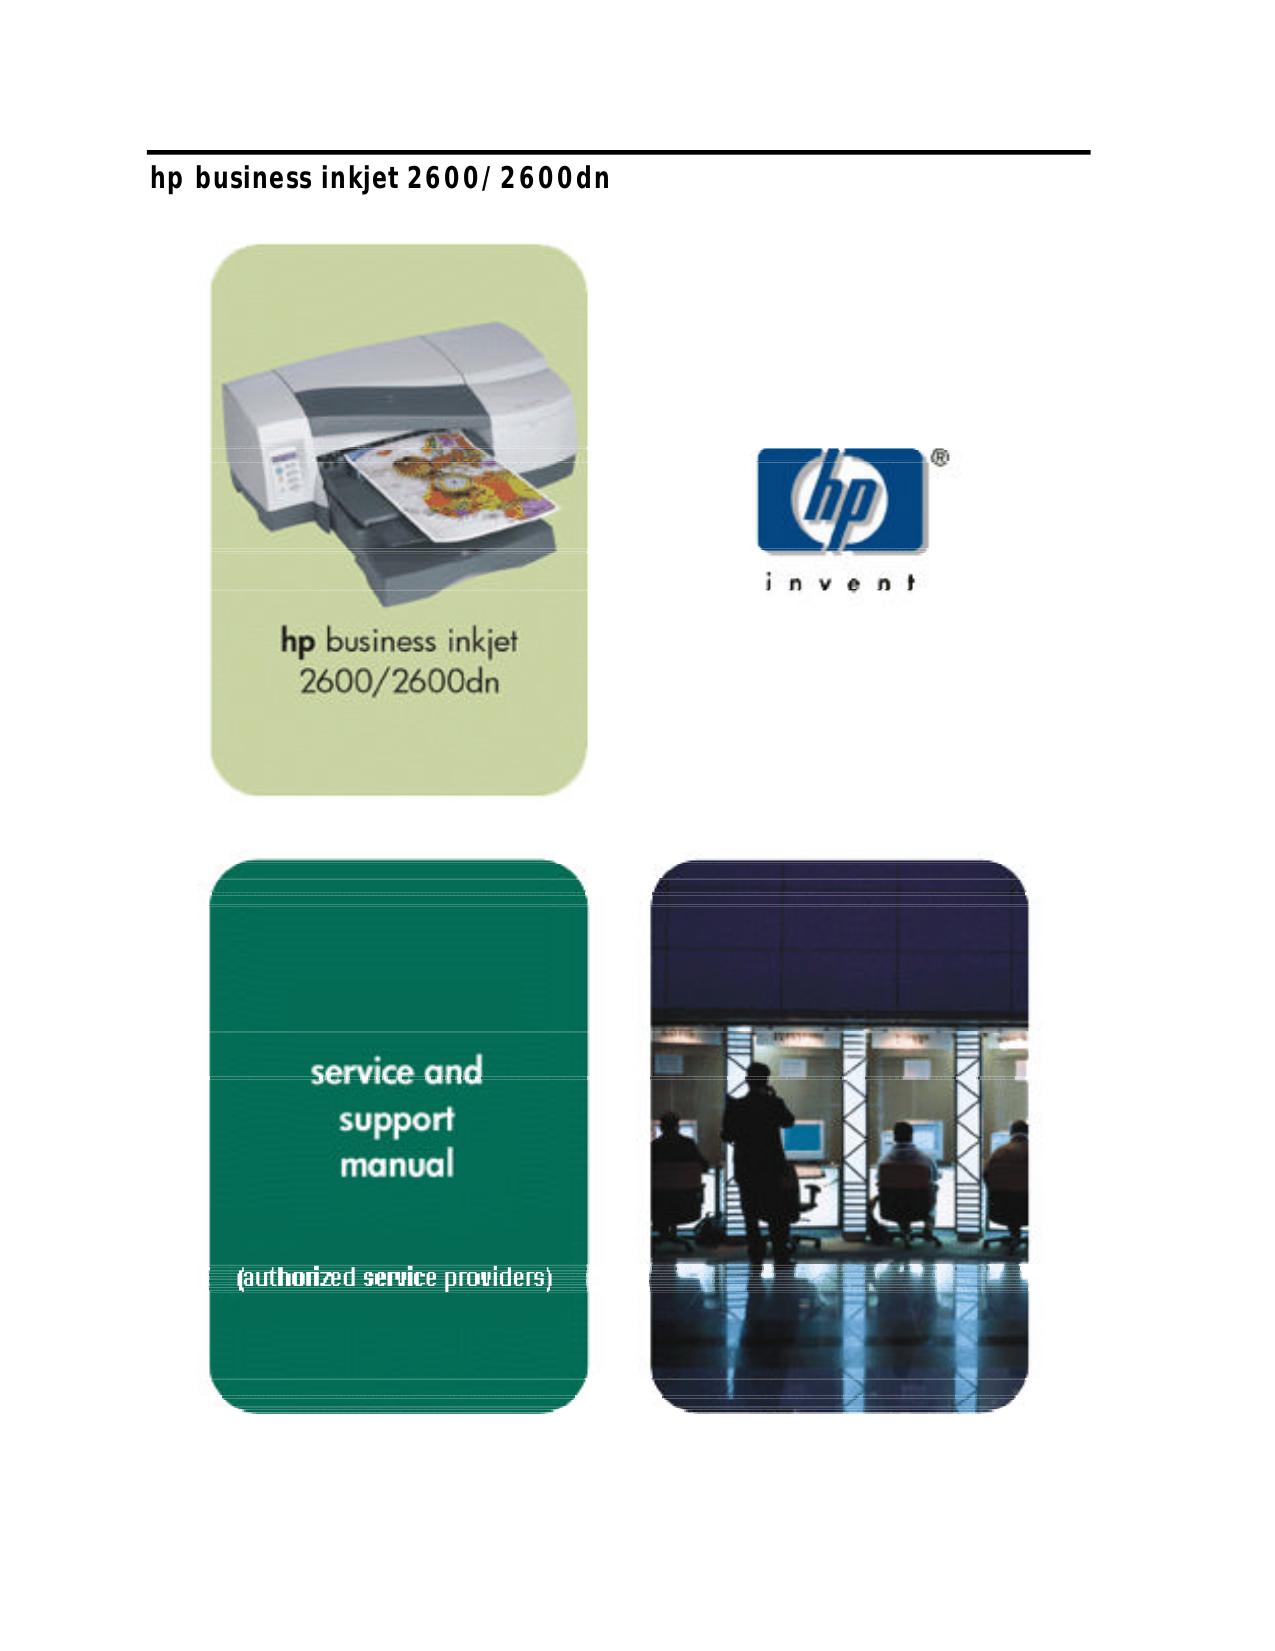 pdf for HP Printer Business Inkjet cp1700d manual